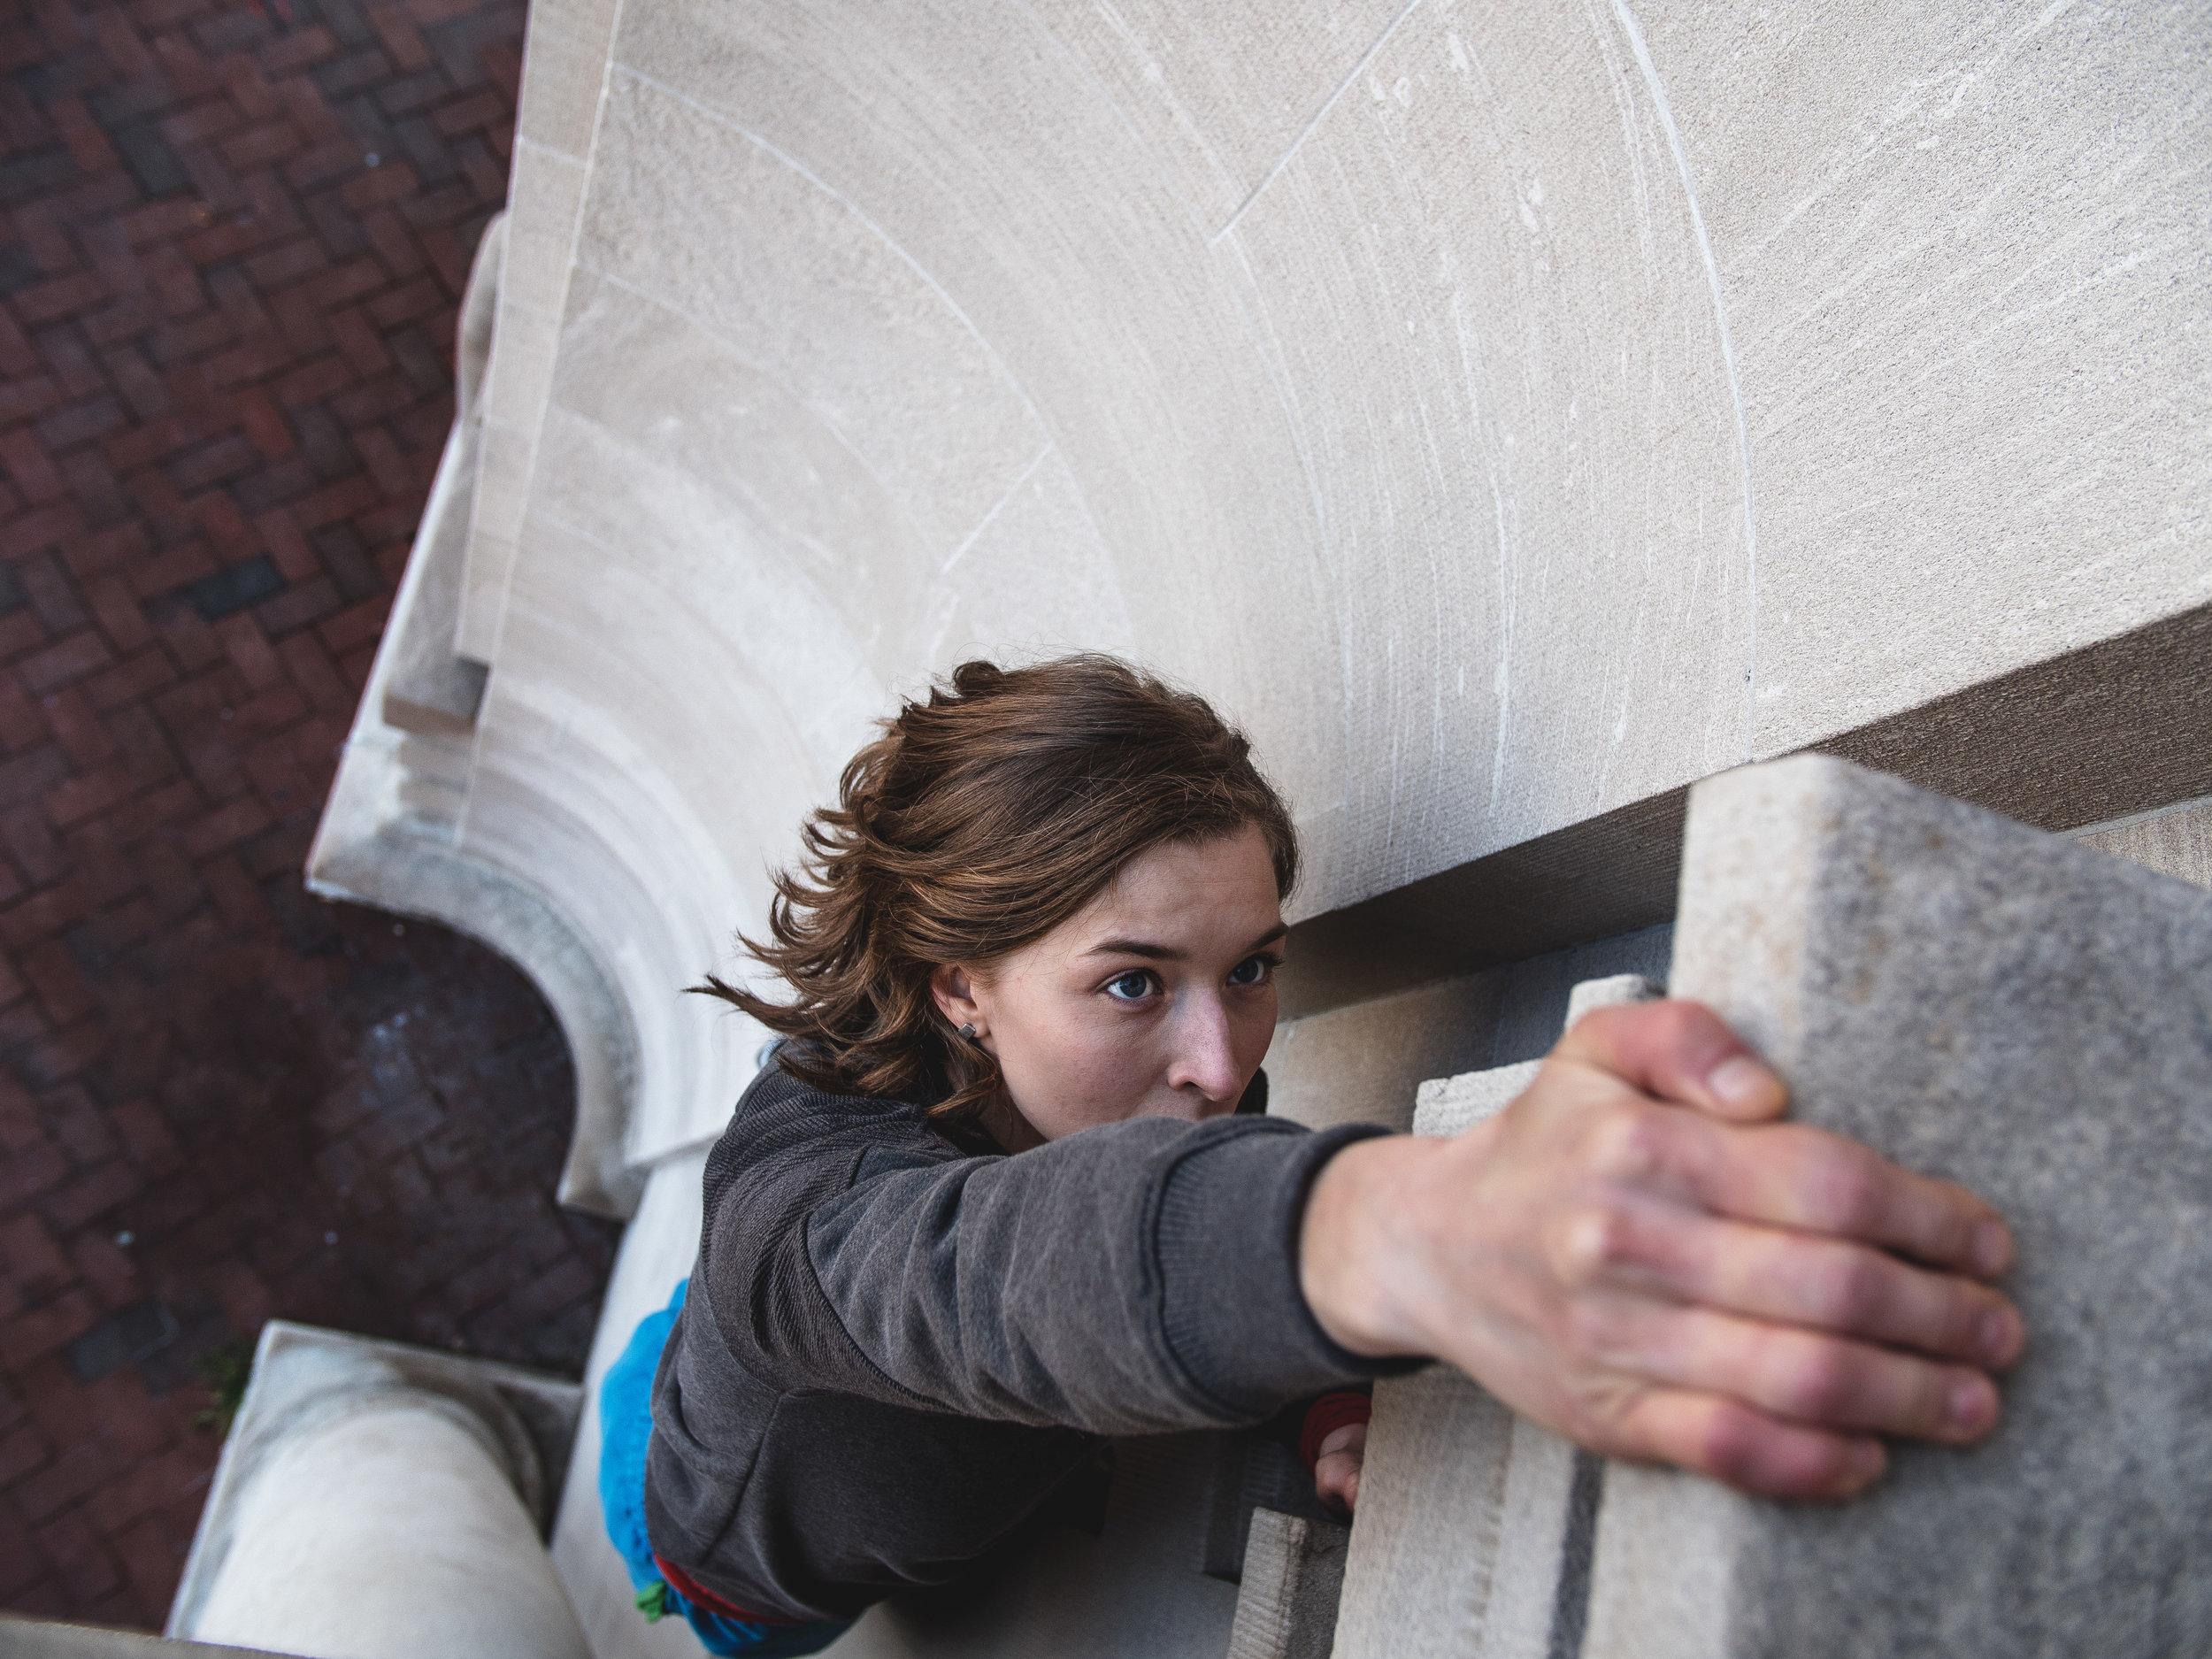 Nikkie-Zanevsky-Parkour-Freerunning-Skochypstiks-NYC-New-York-Urbex-Steve-Zavitz-Climbing-Manhattan